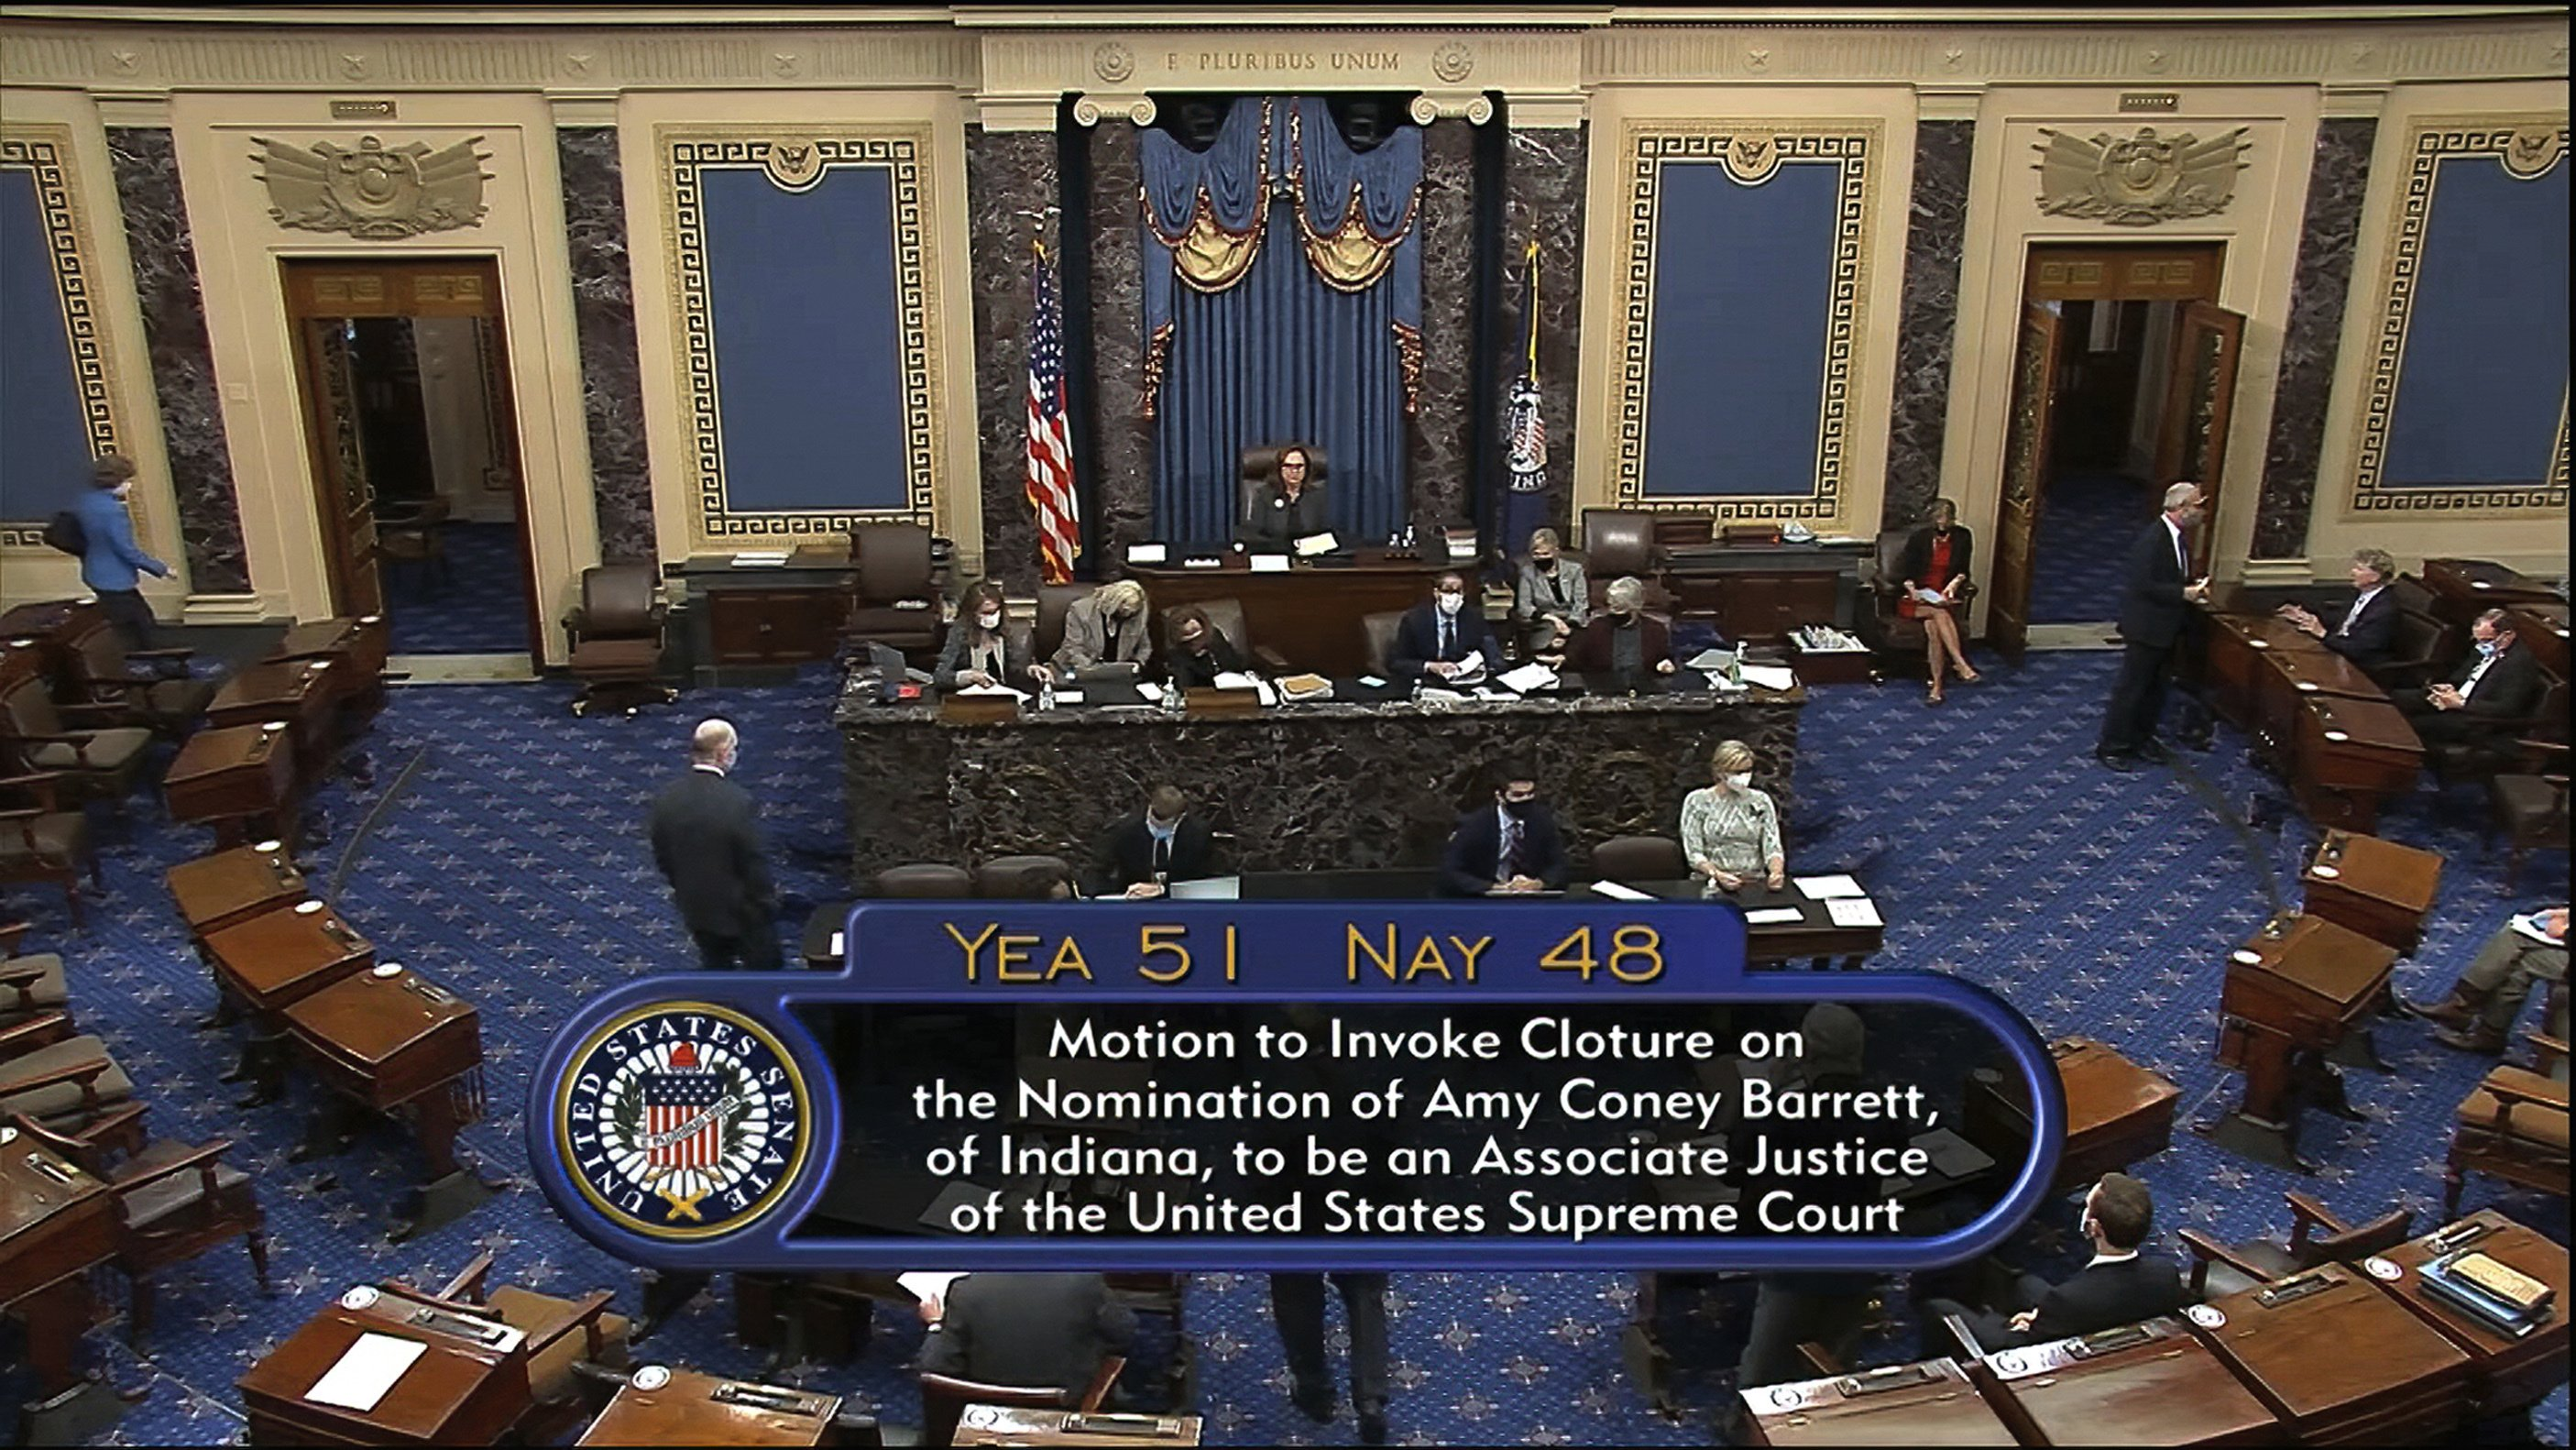 BREAKING: Senate advances Supreme Court nominee Amy Coney Barrett in near party-line vote; confirmation Monday all but assured.